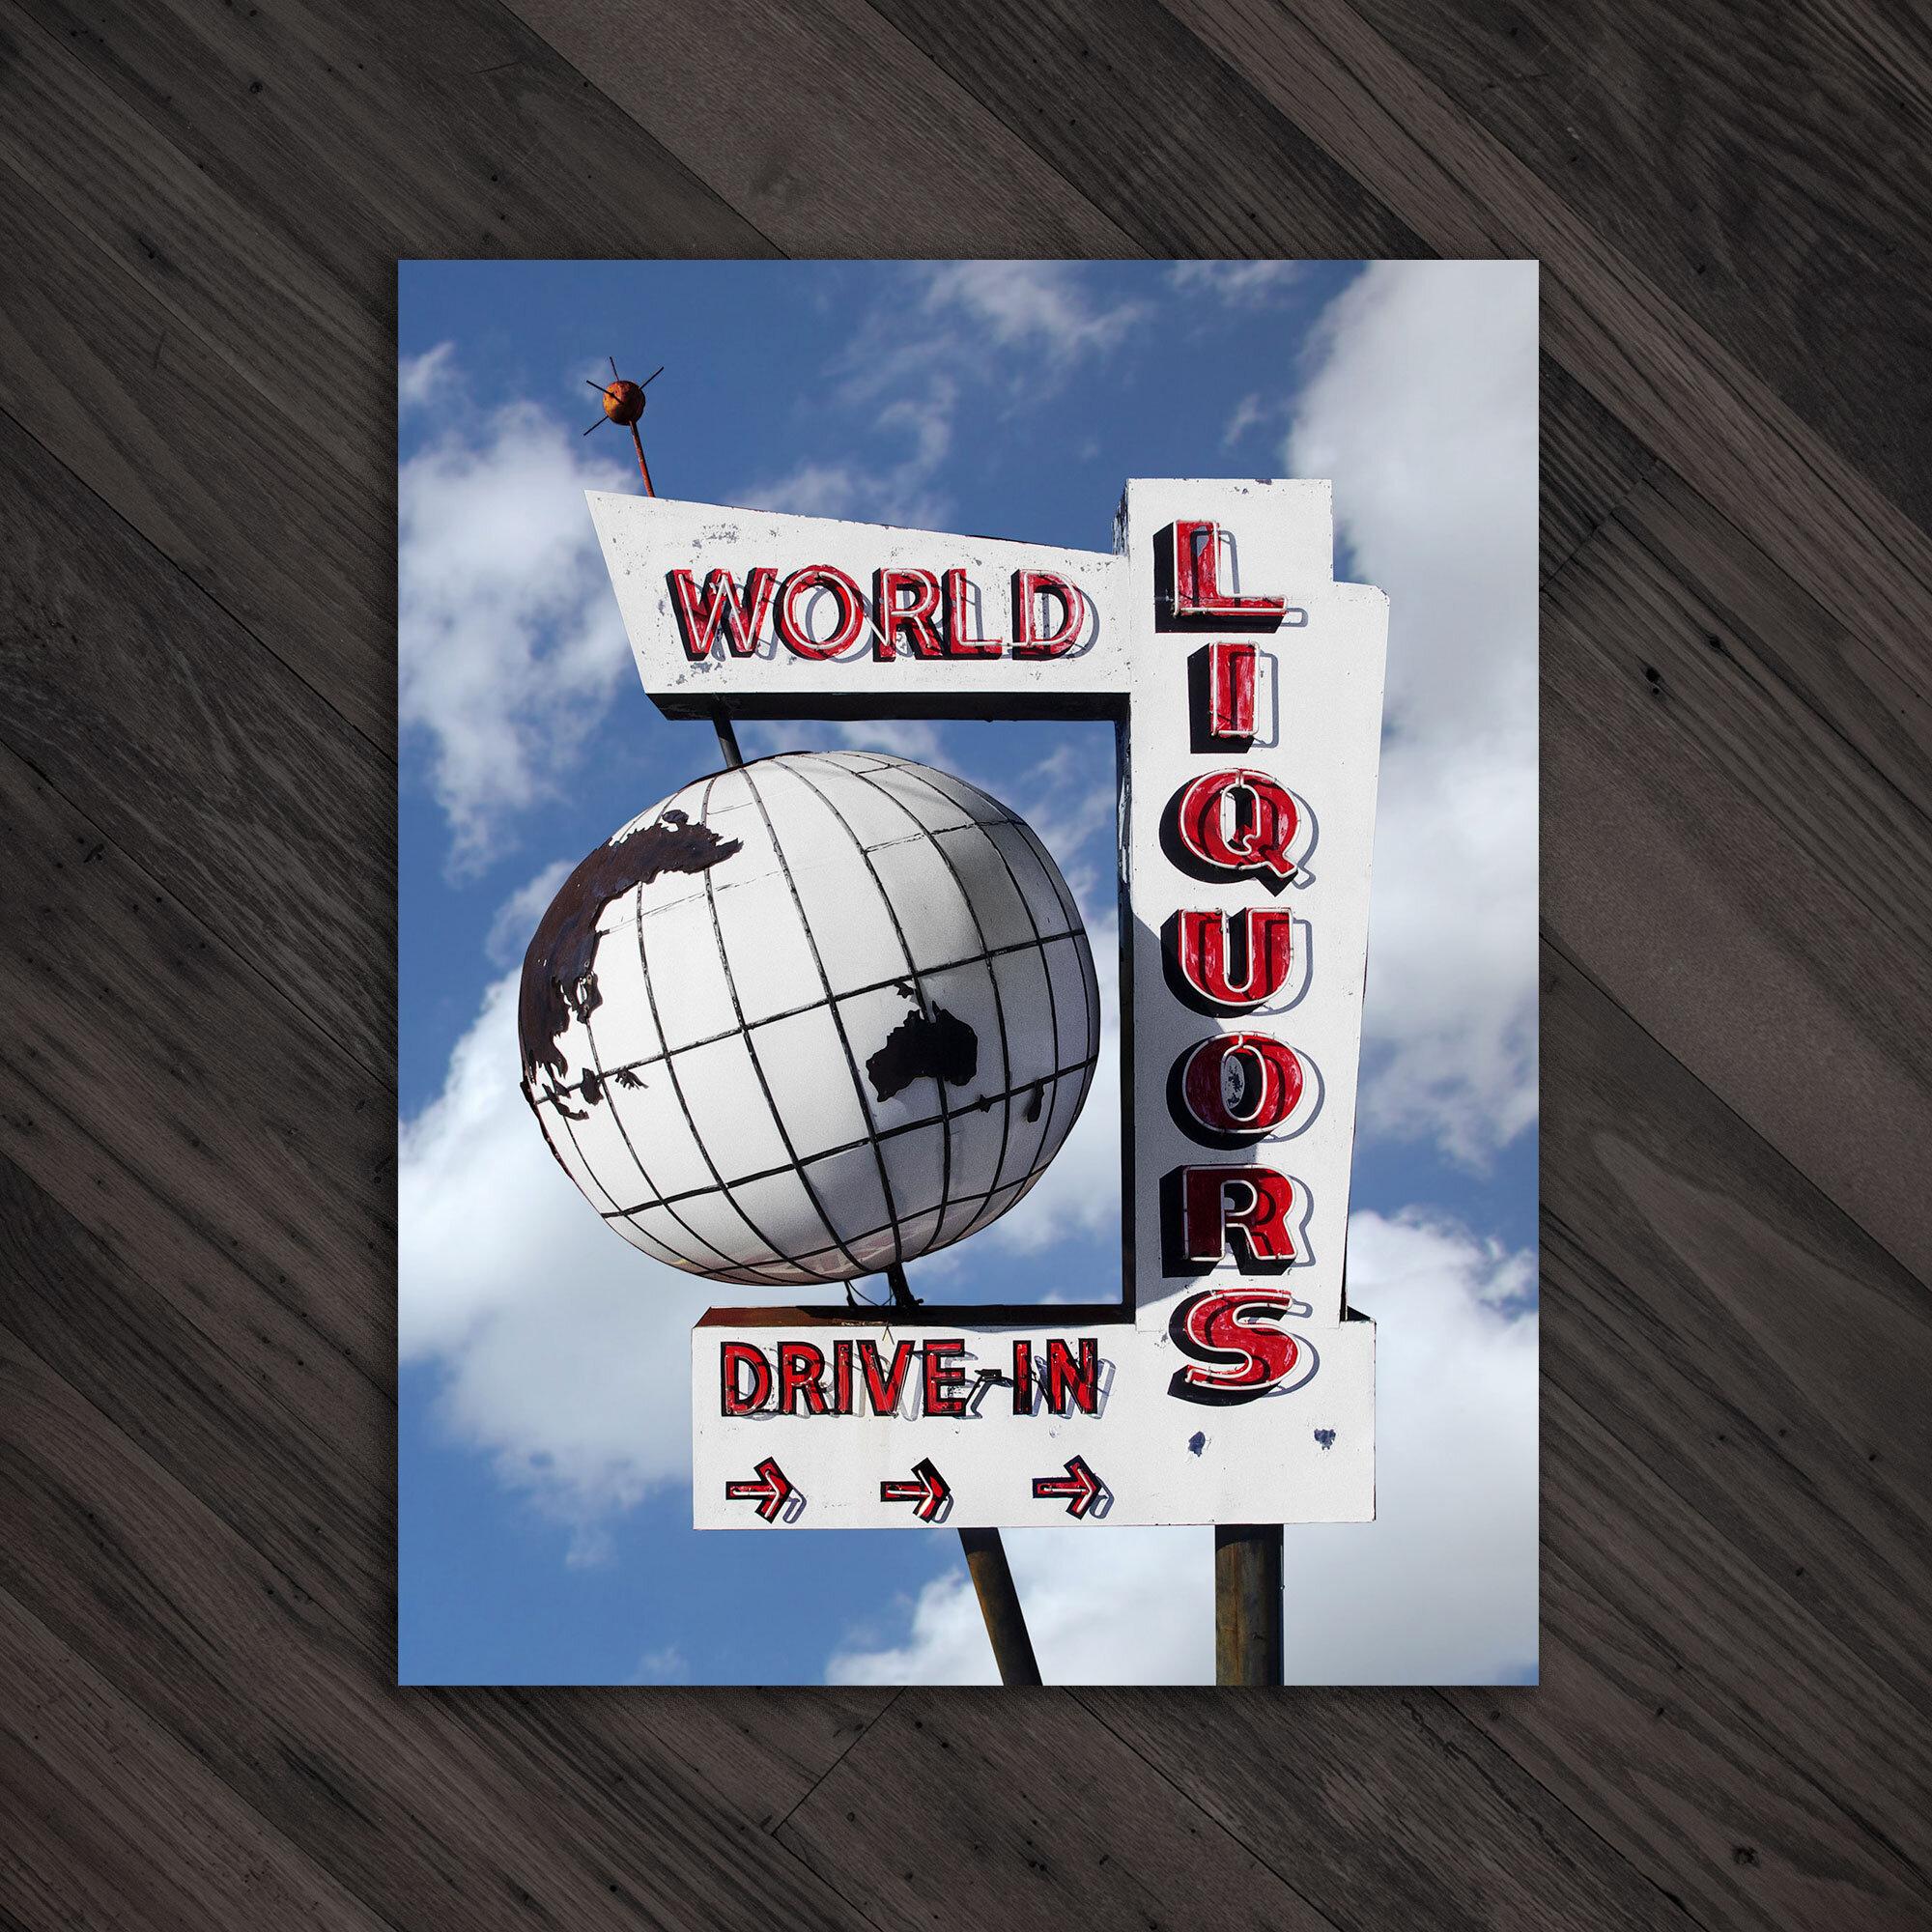 vintage-neon-project_world-liquors-sign-print.jpg